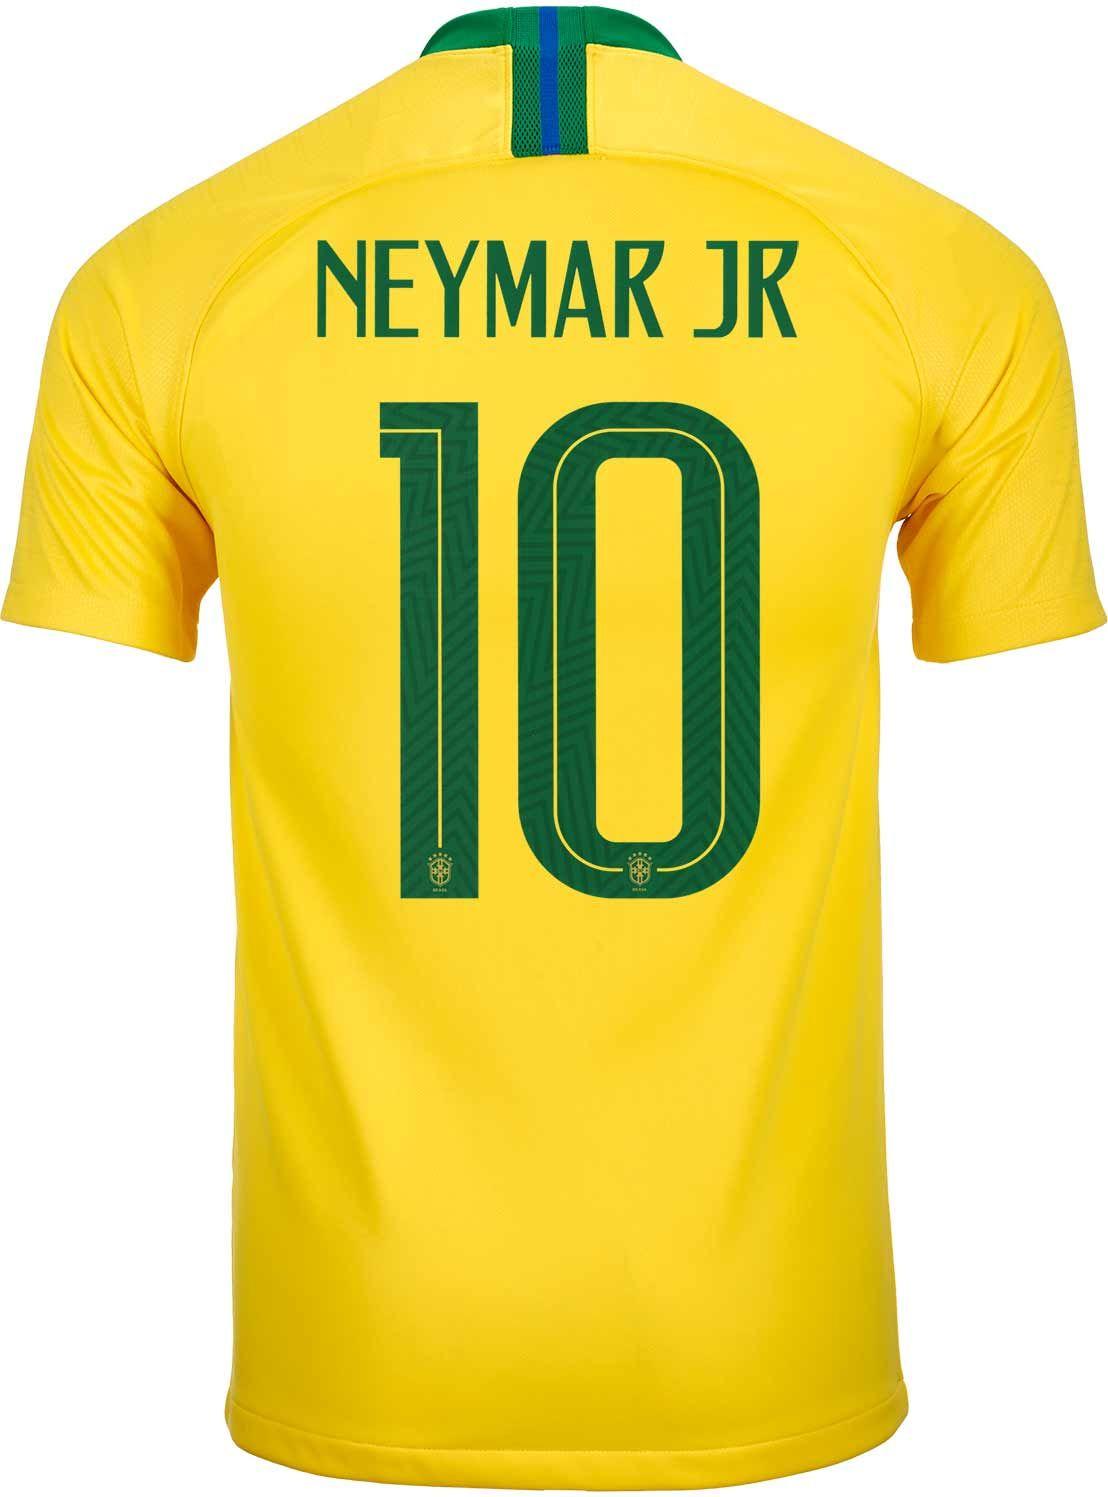 201819 nike neymar jr brazil home jersey neymar neymar